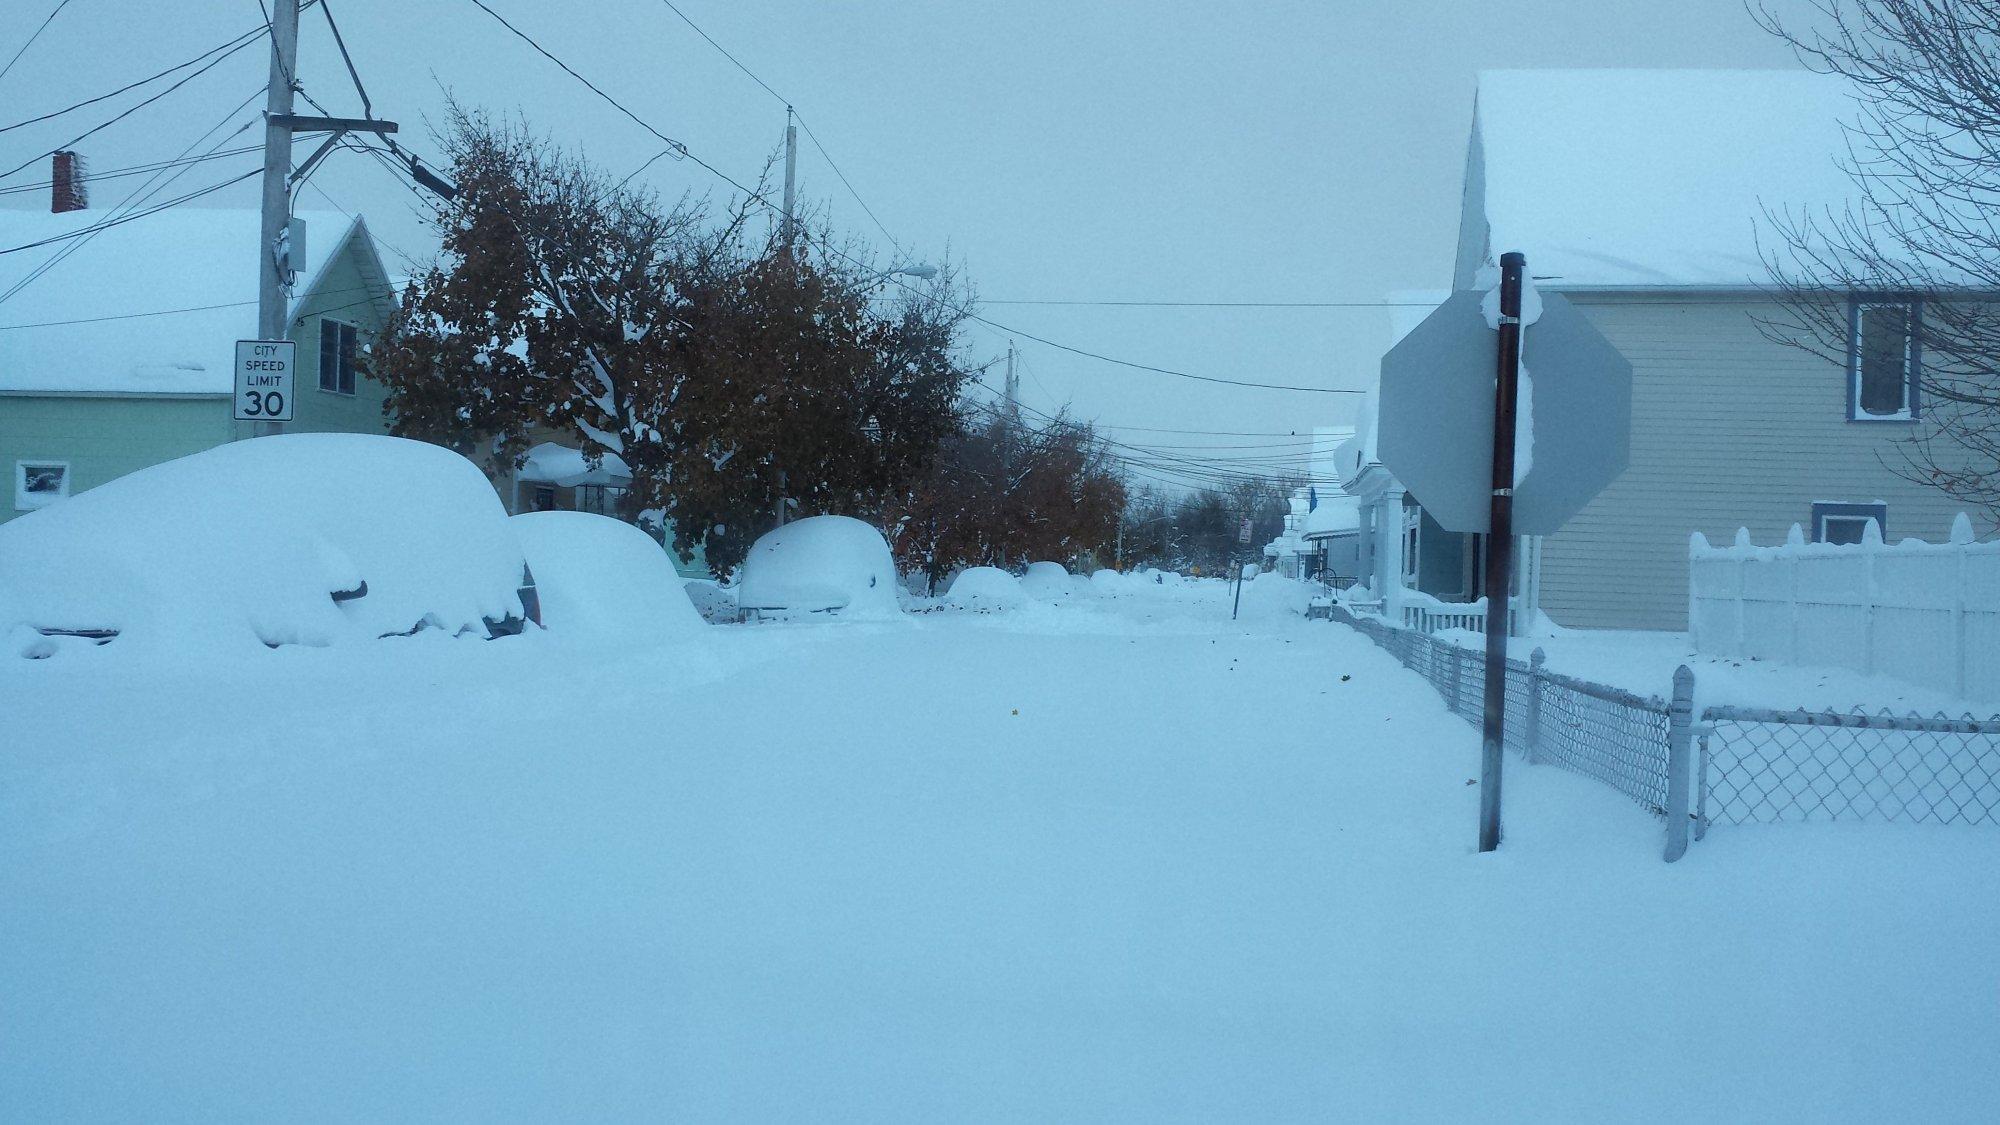 Buffalo, New York buried in 6 feet of snow.